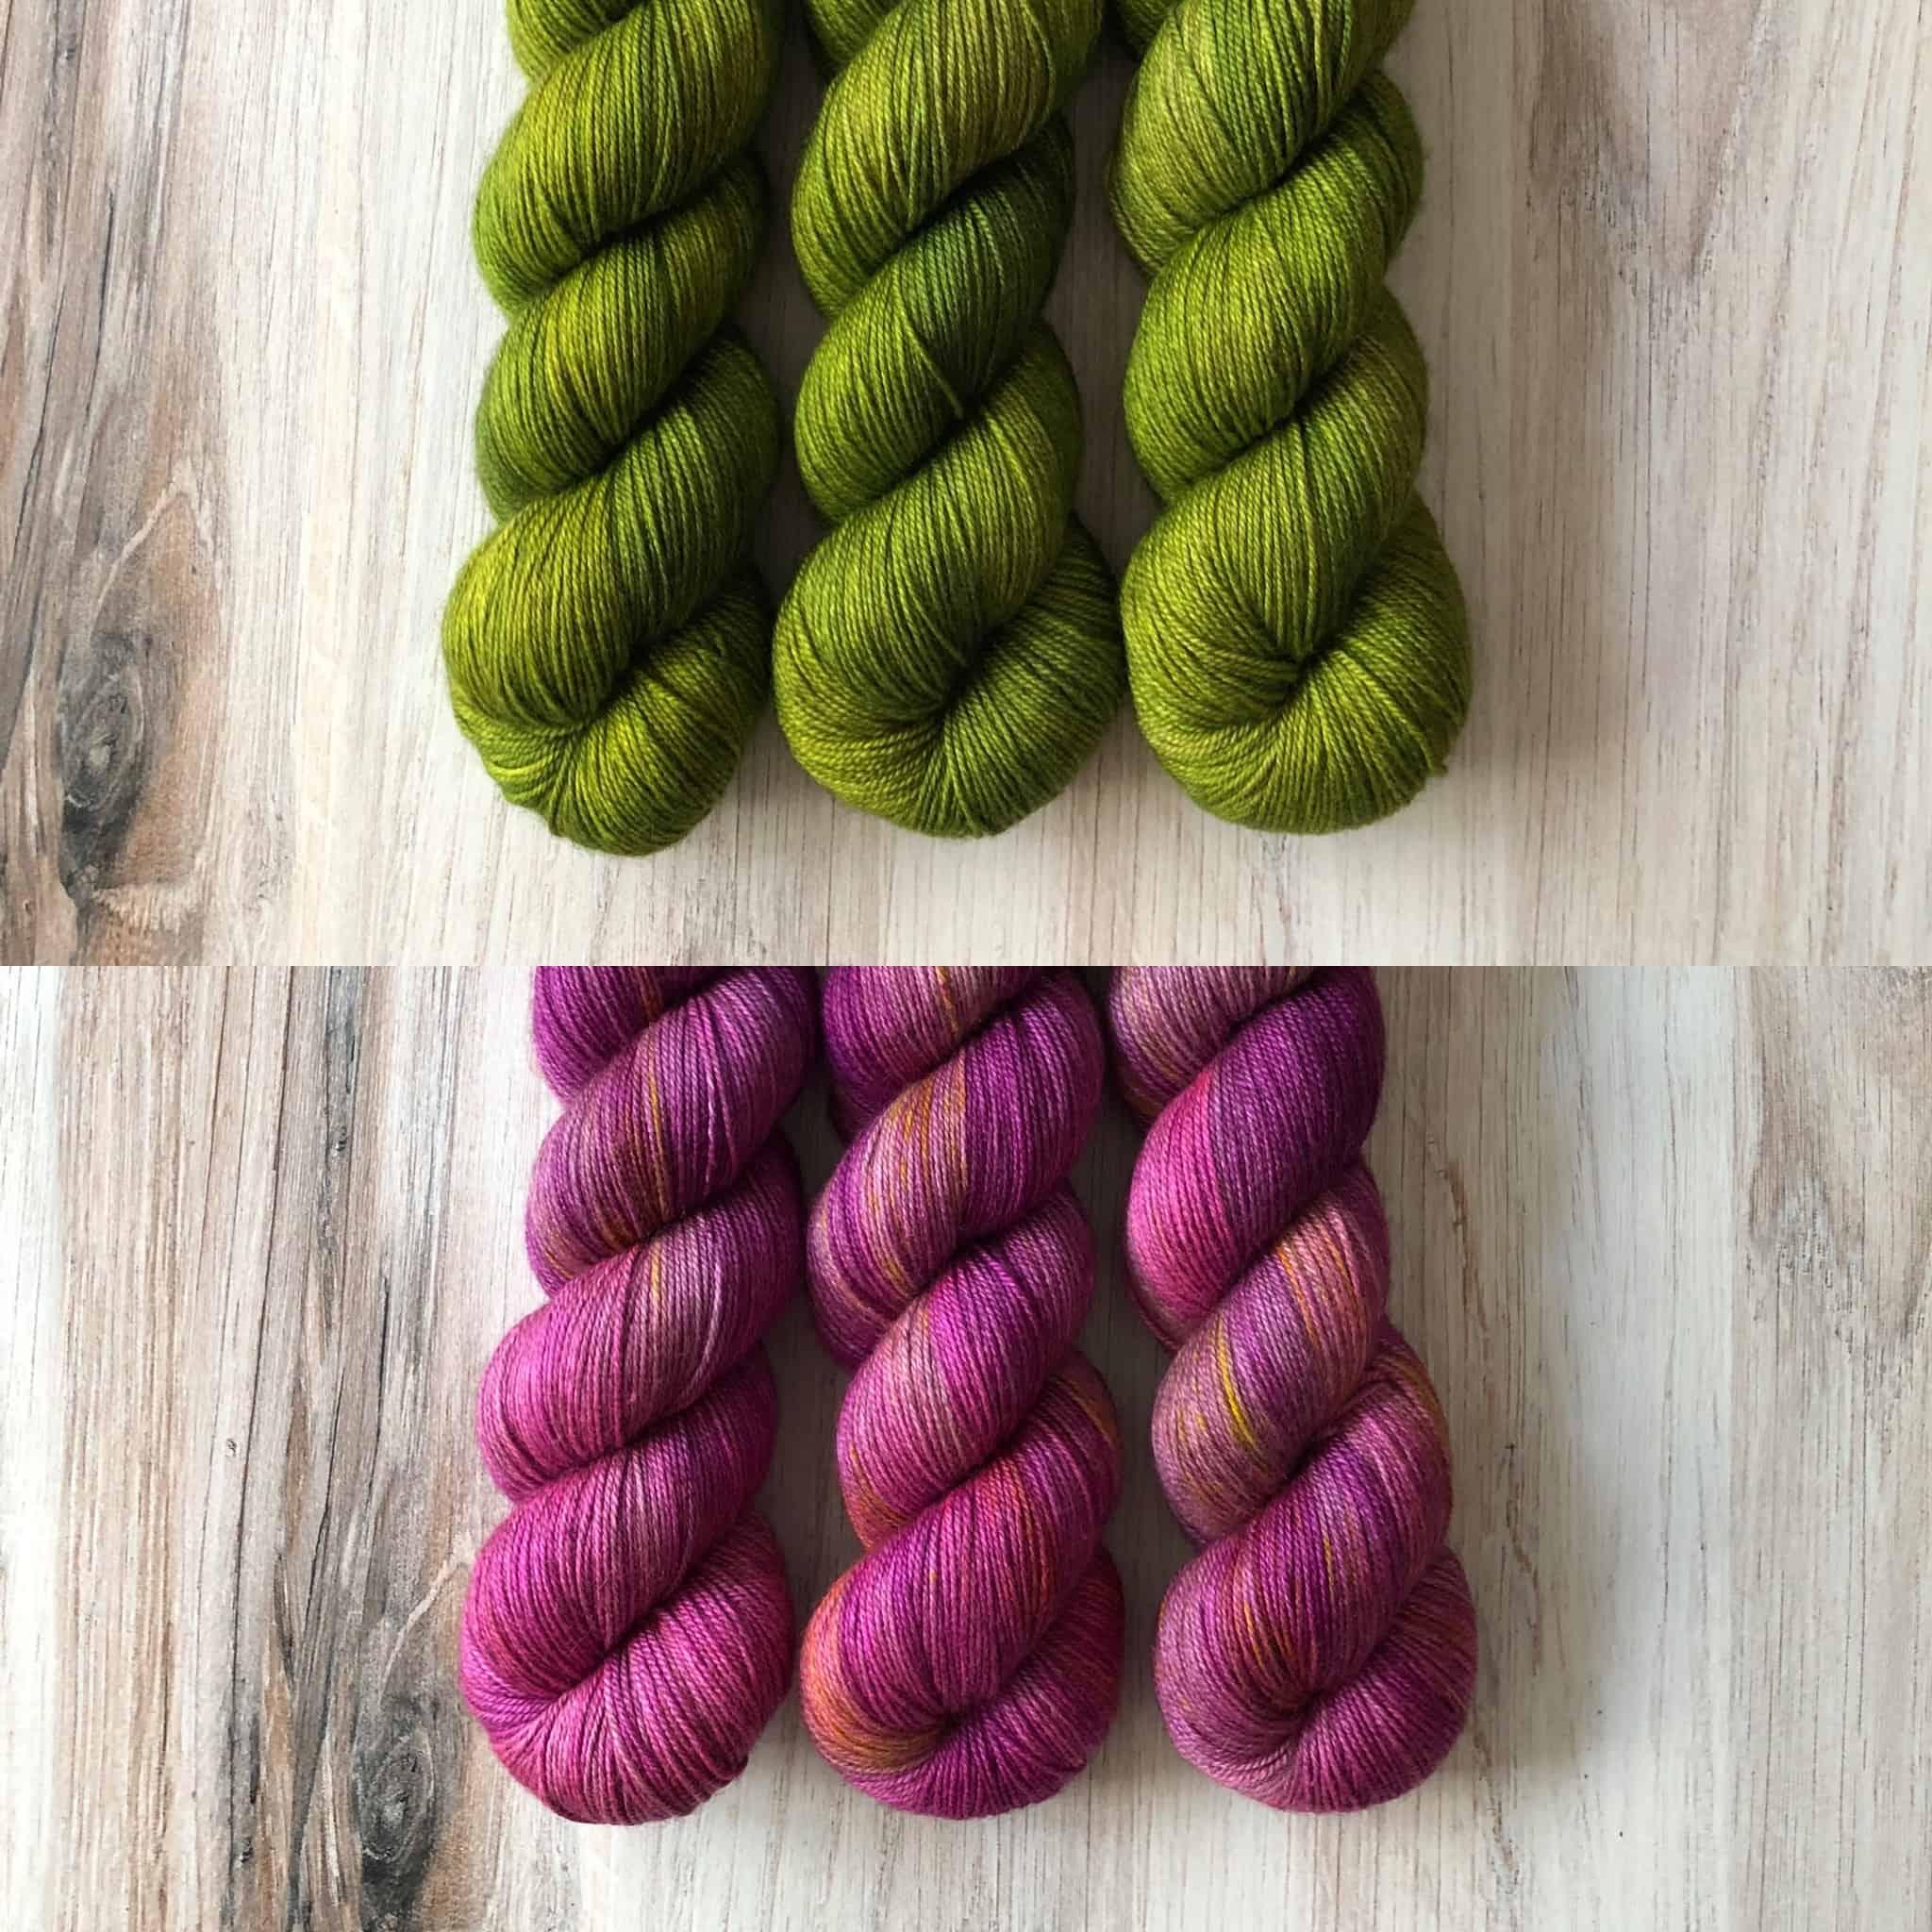 Green and pink yarn.